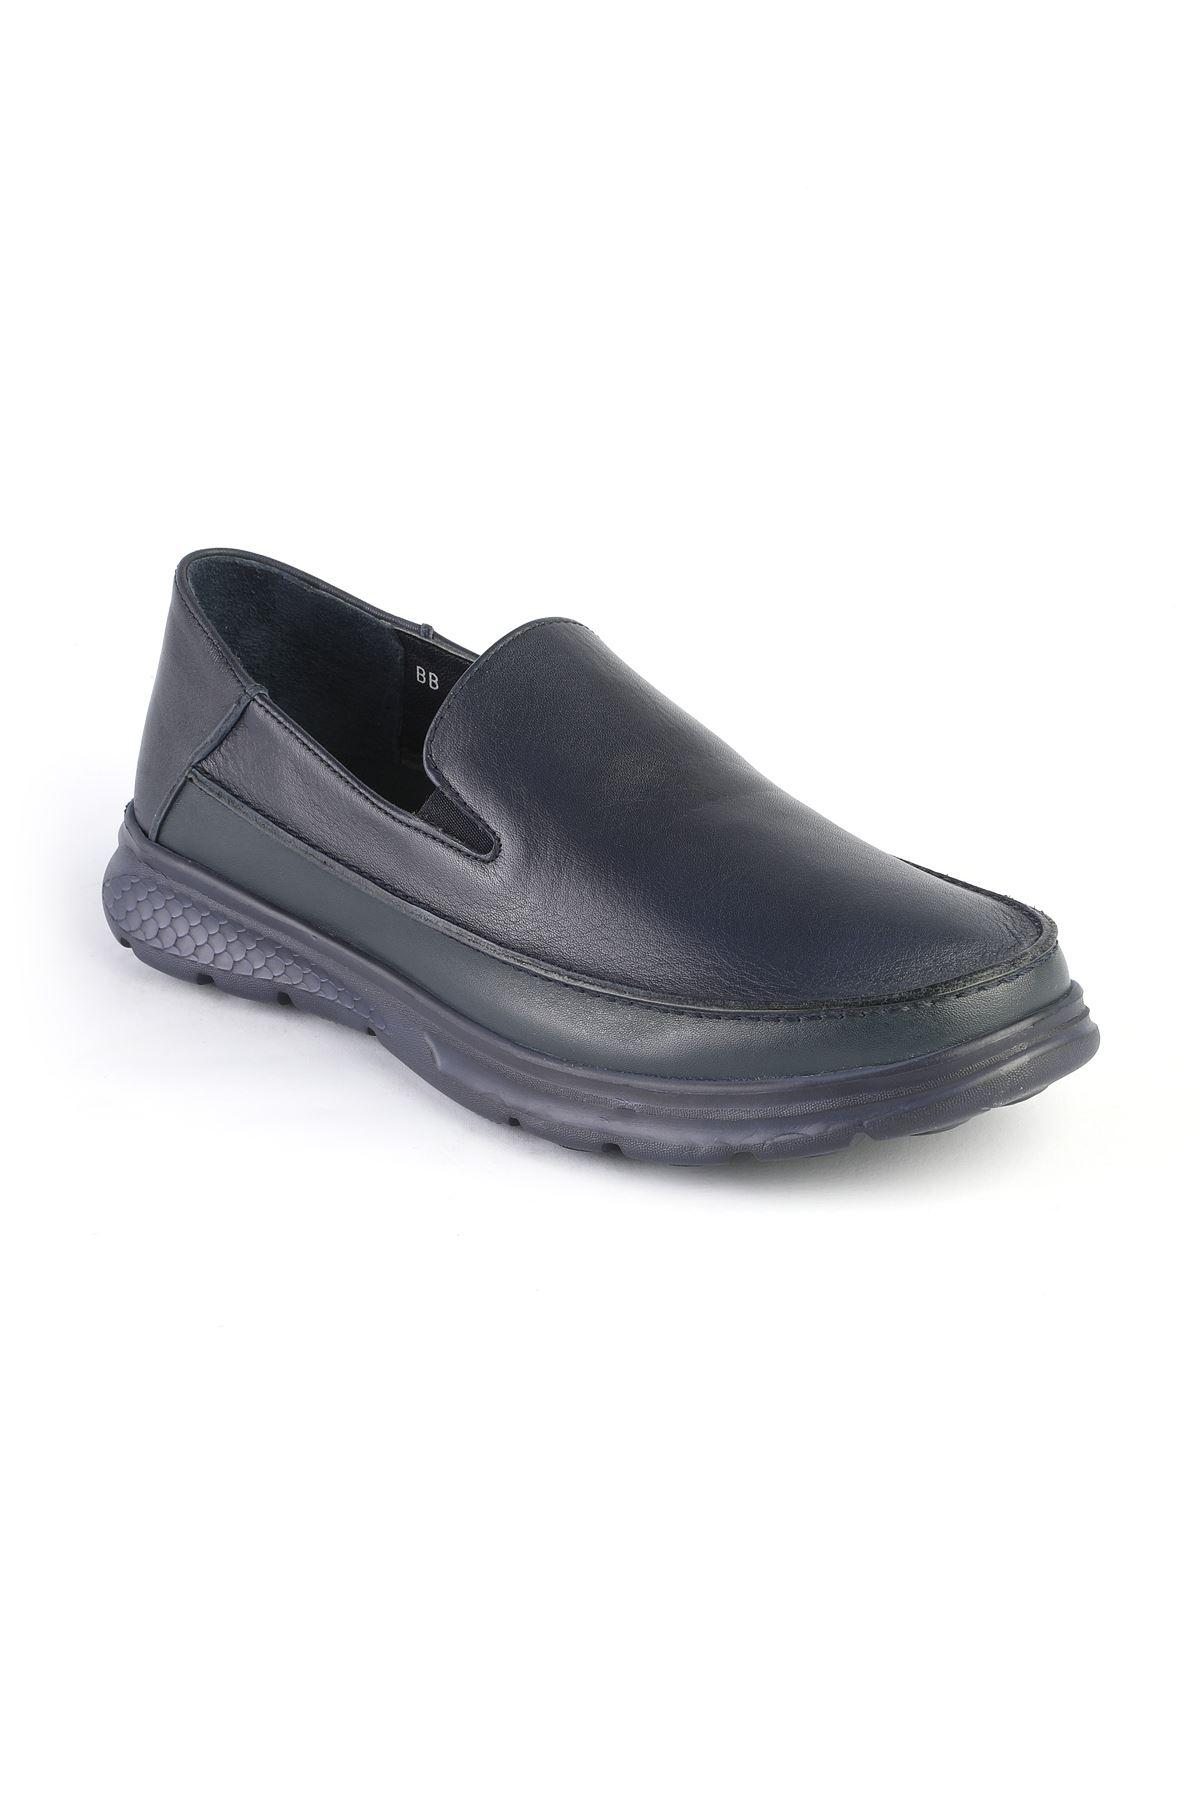 Libero 3223 Lacivert Loafer Ayakkabı